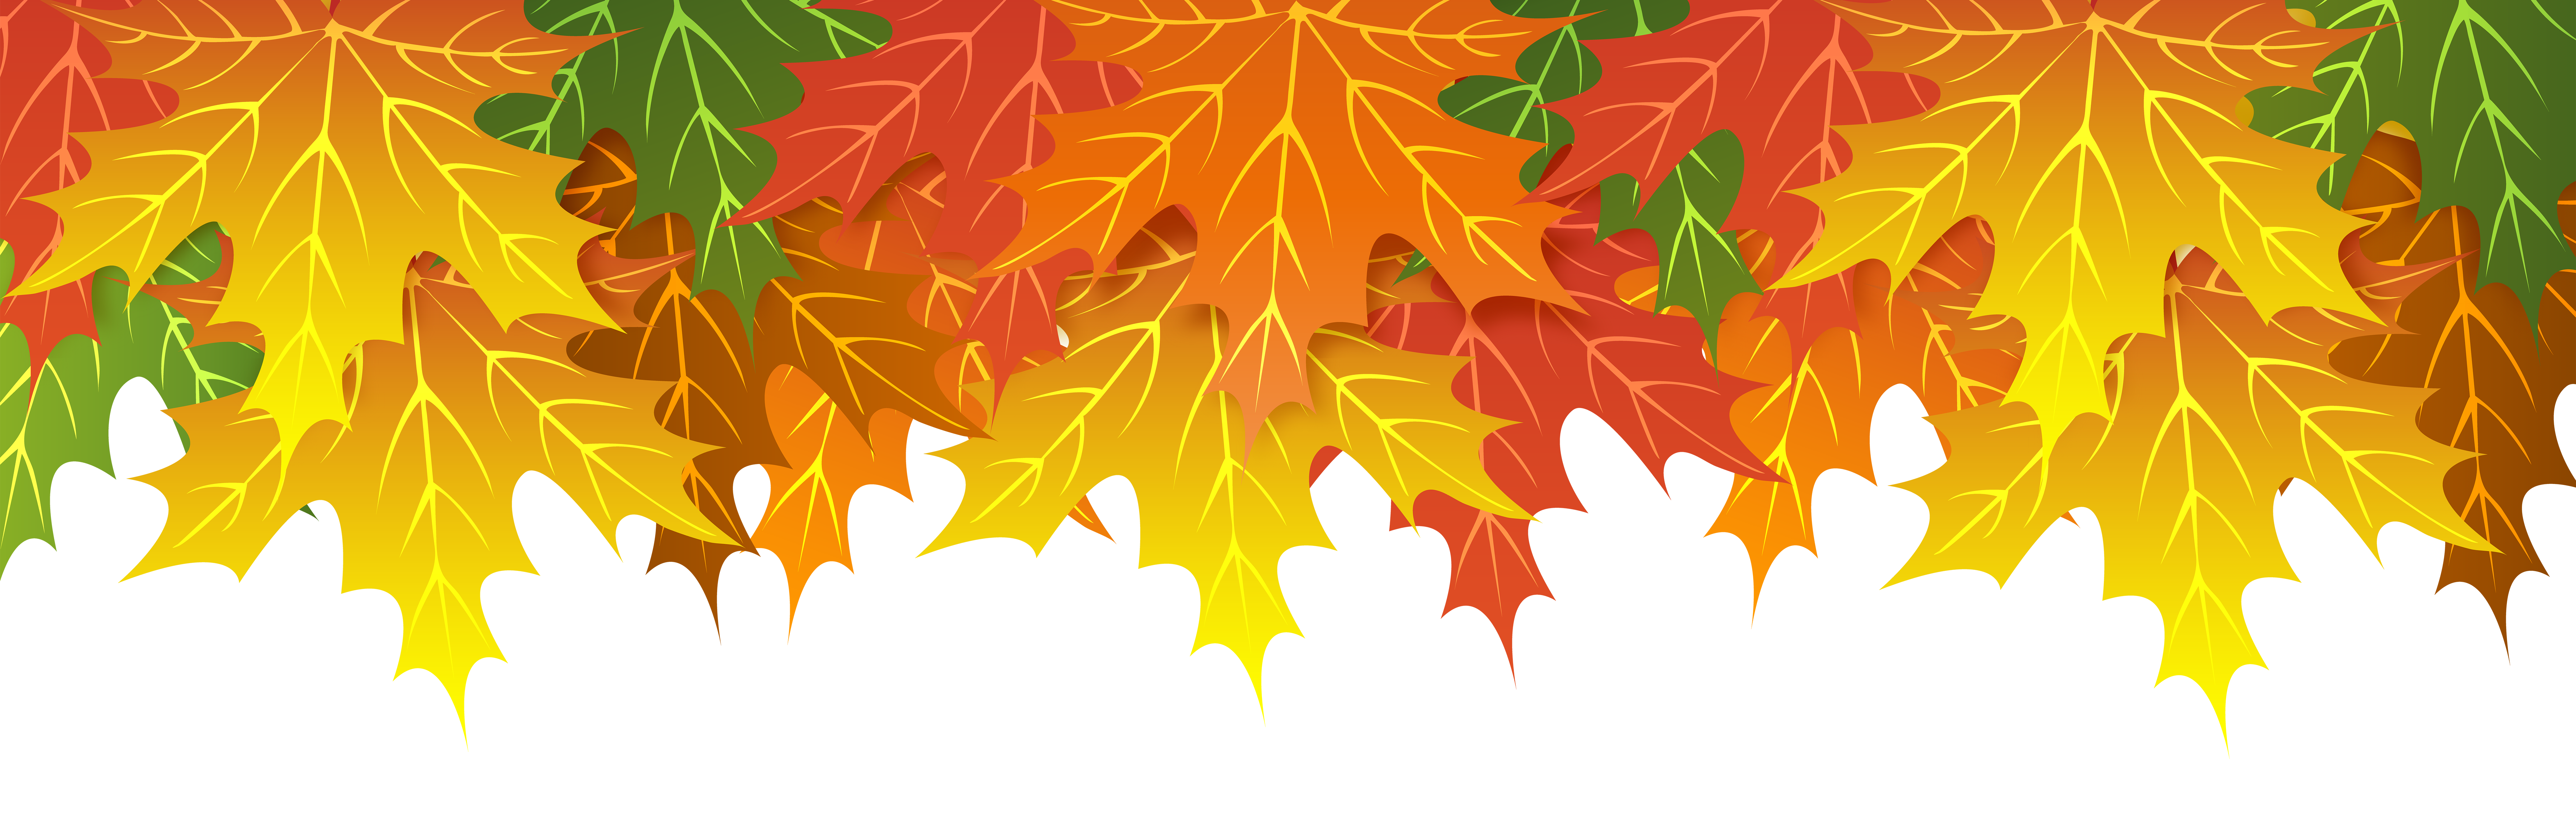 Fall leaves border png. Upper clip art image